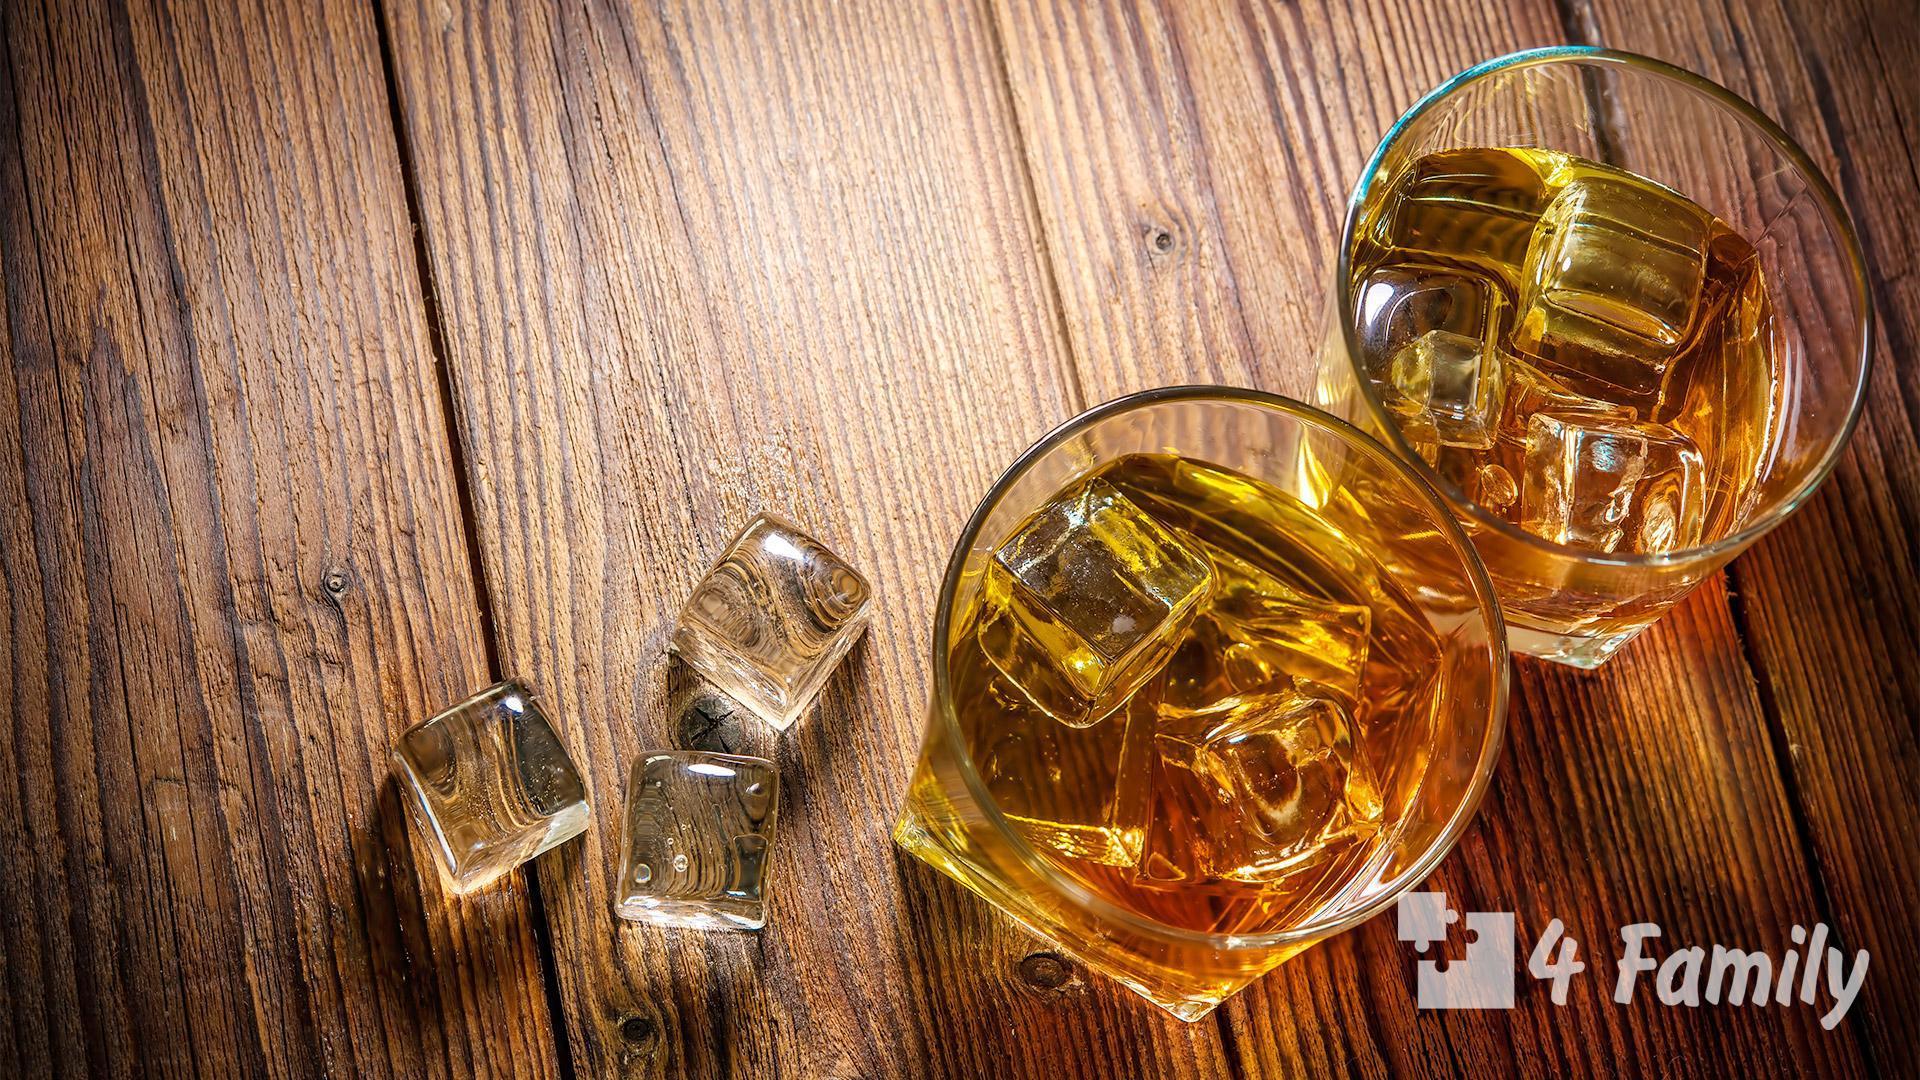 4Family Как пить Виски Бэллс (Bell's)